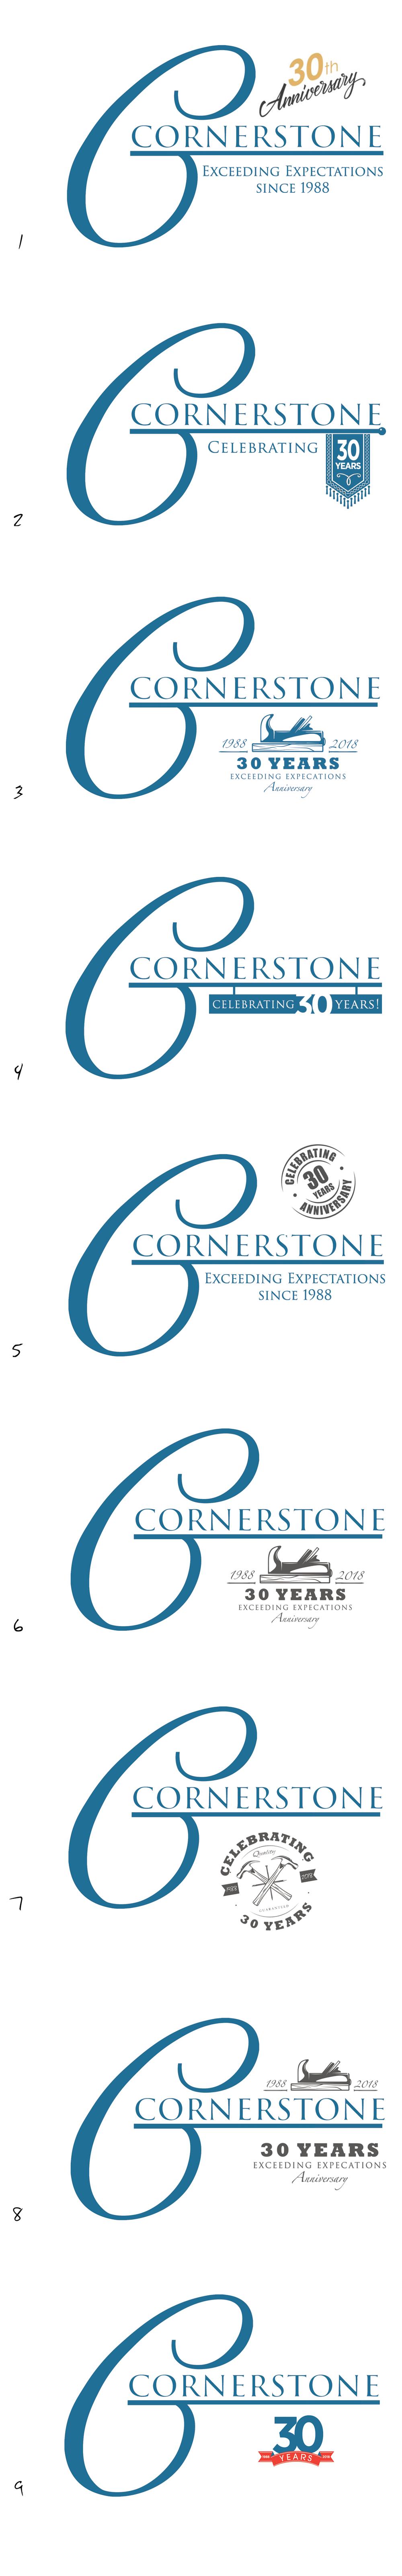 CS Anniversary Logos 12-18-17.png